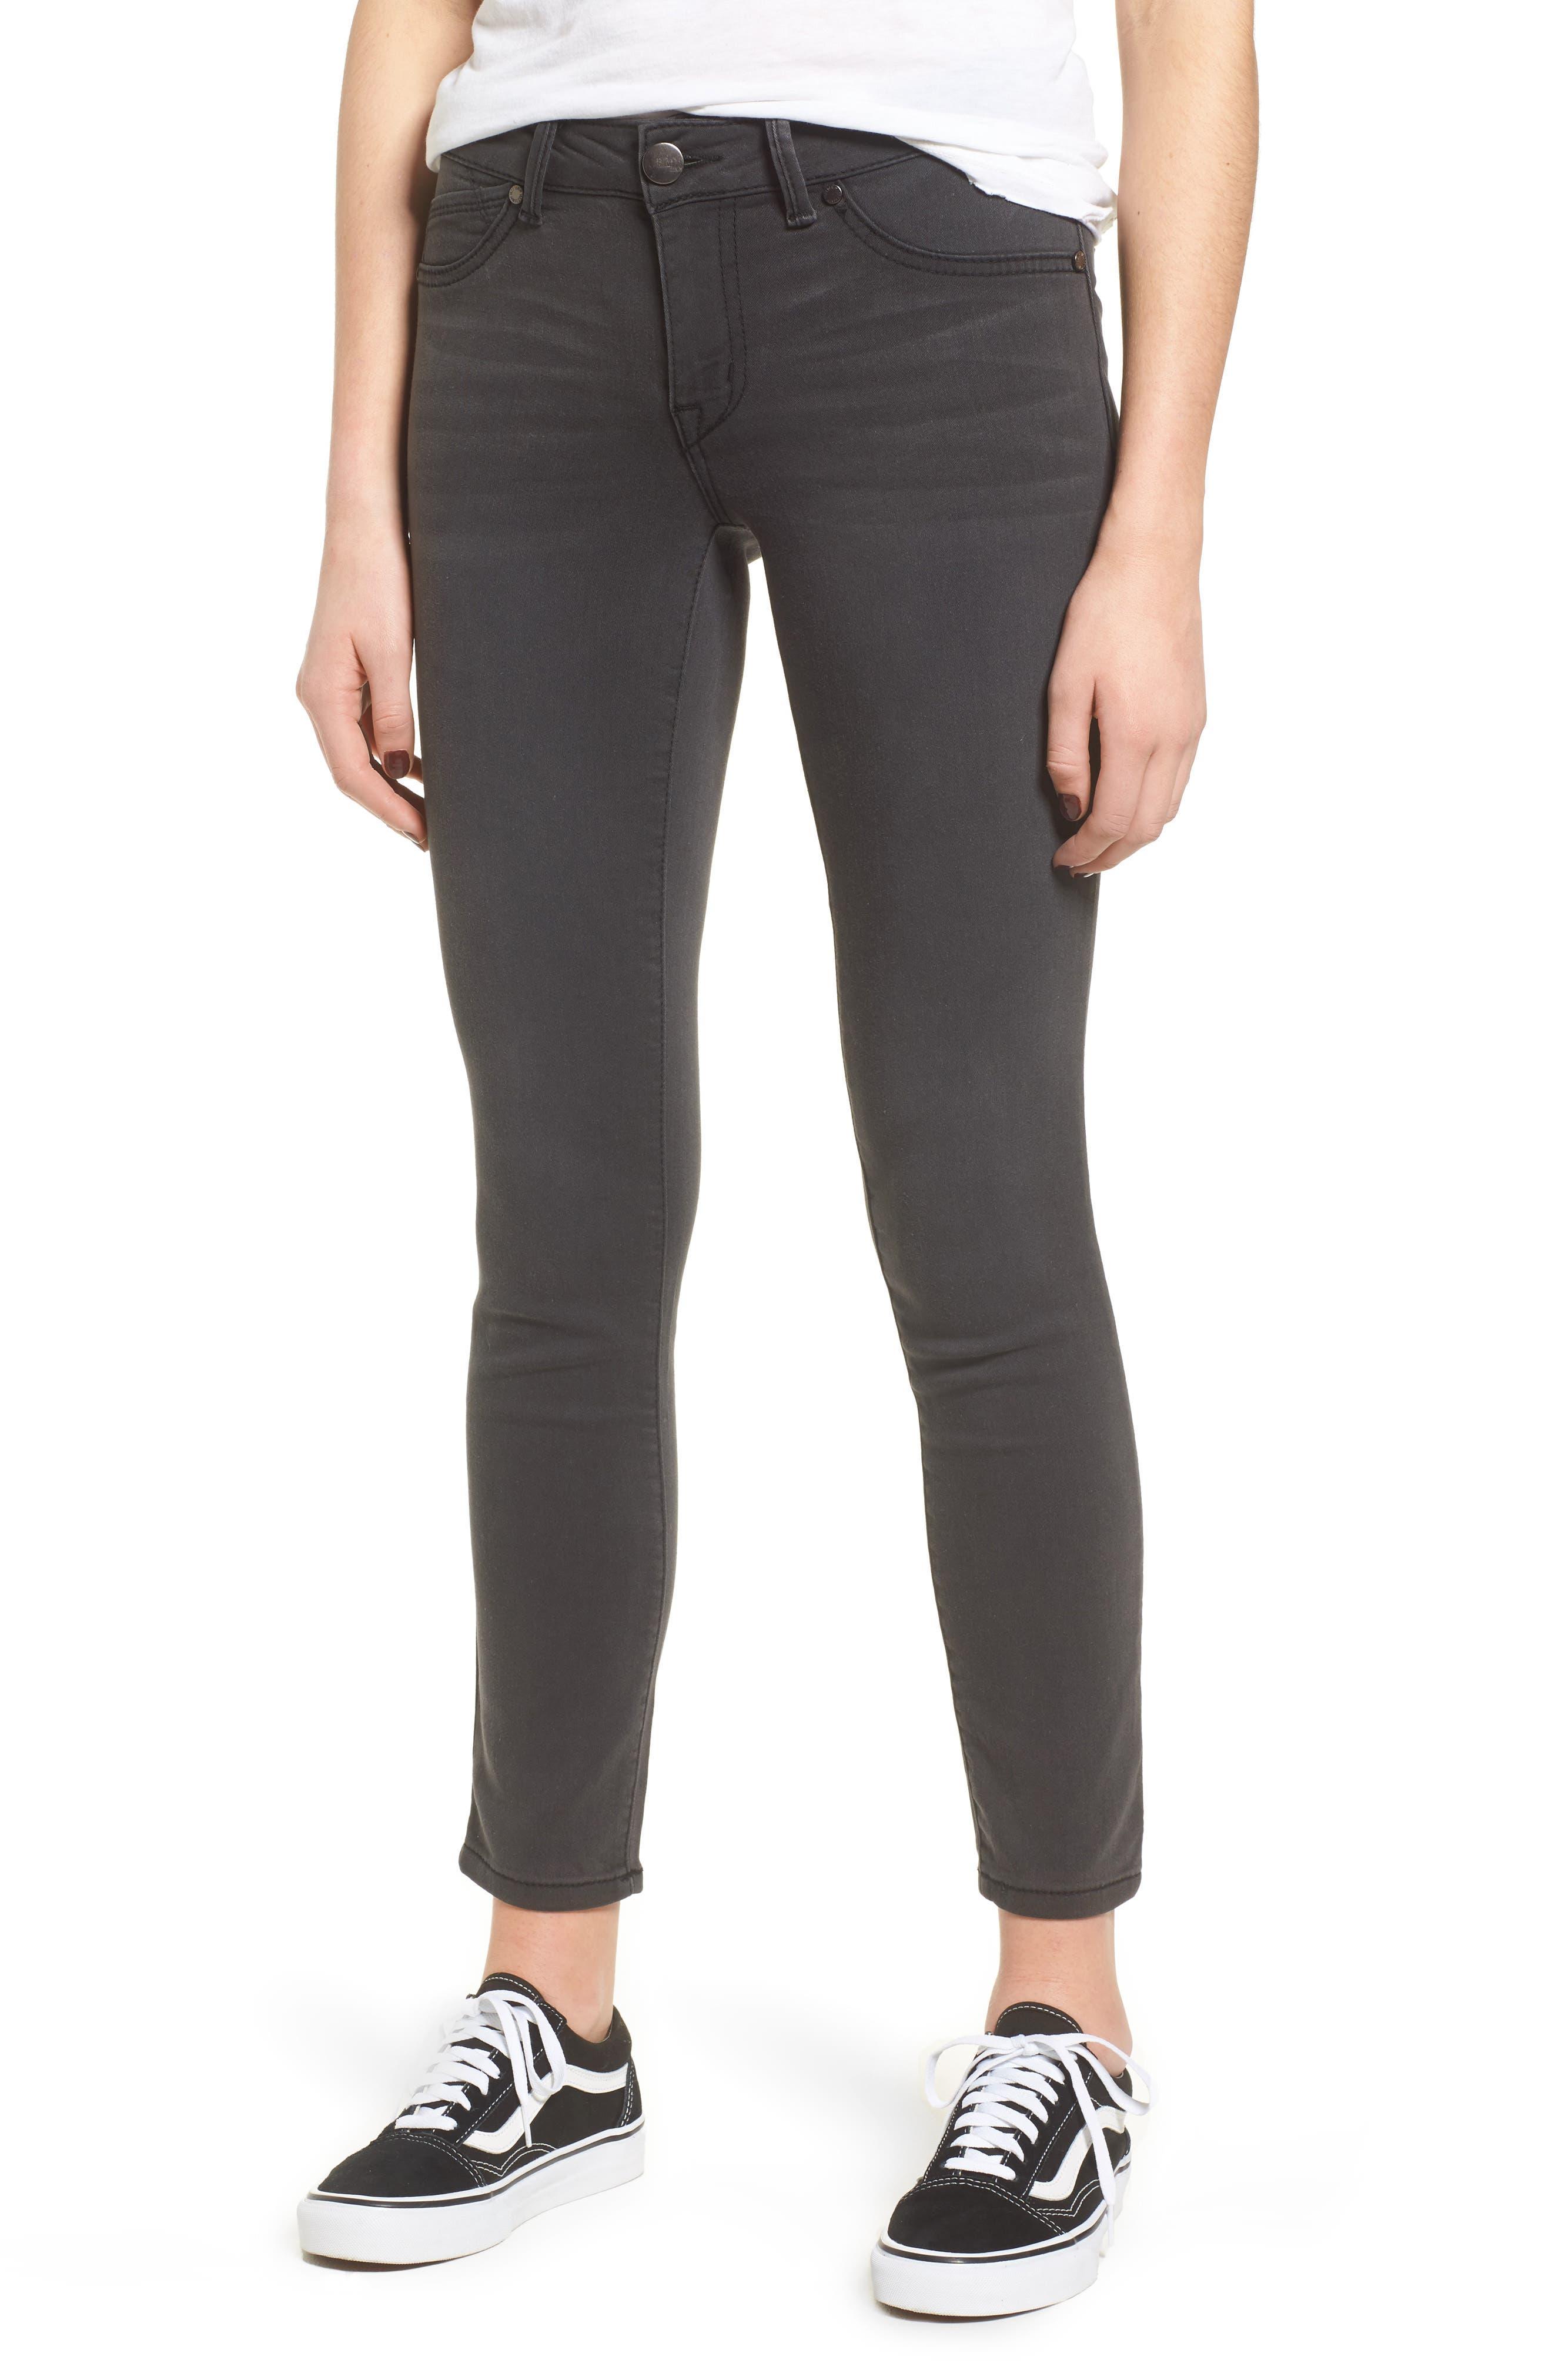 1822 Denim Contour Ankle Skinny Jeans